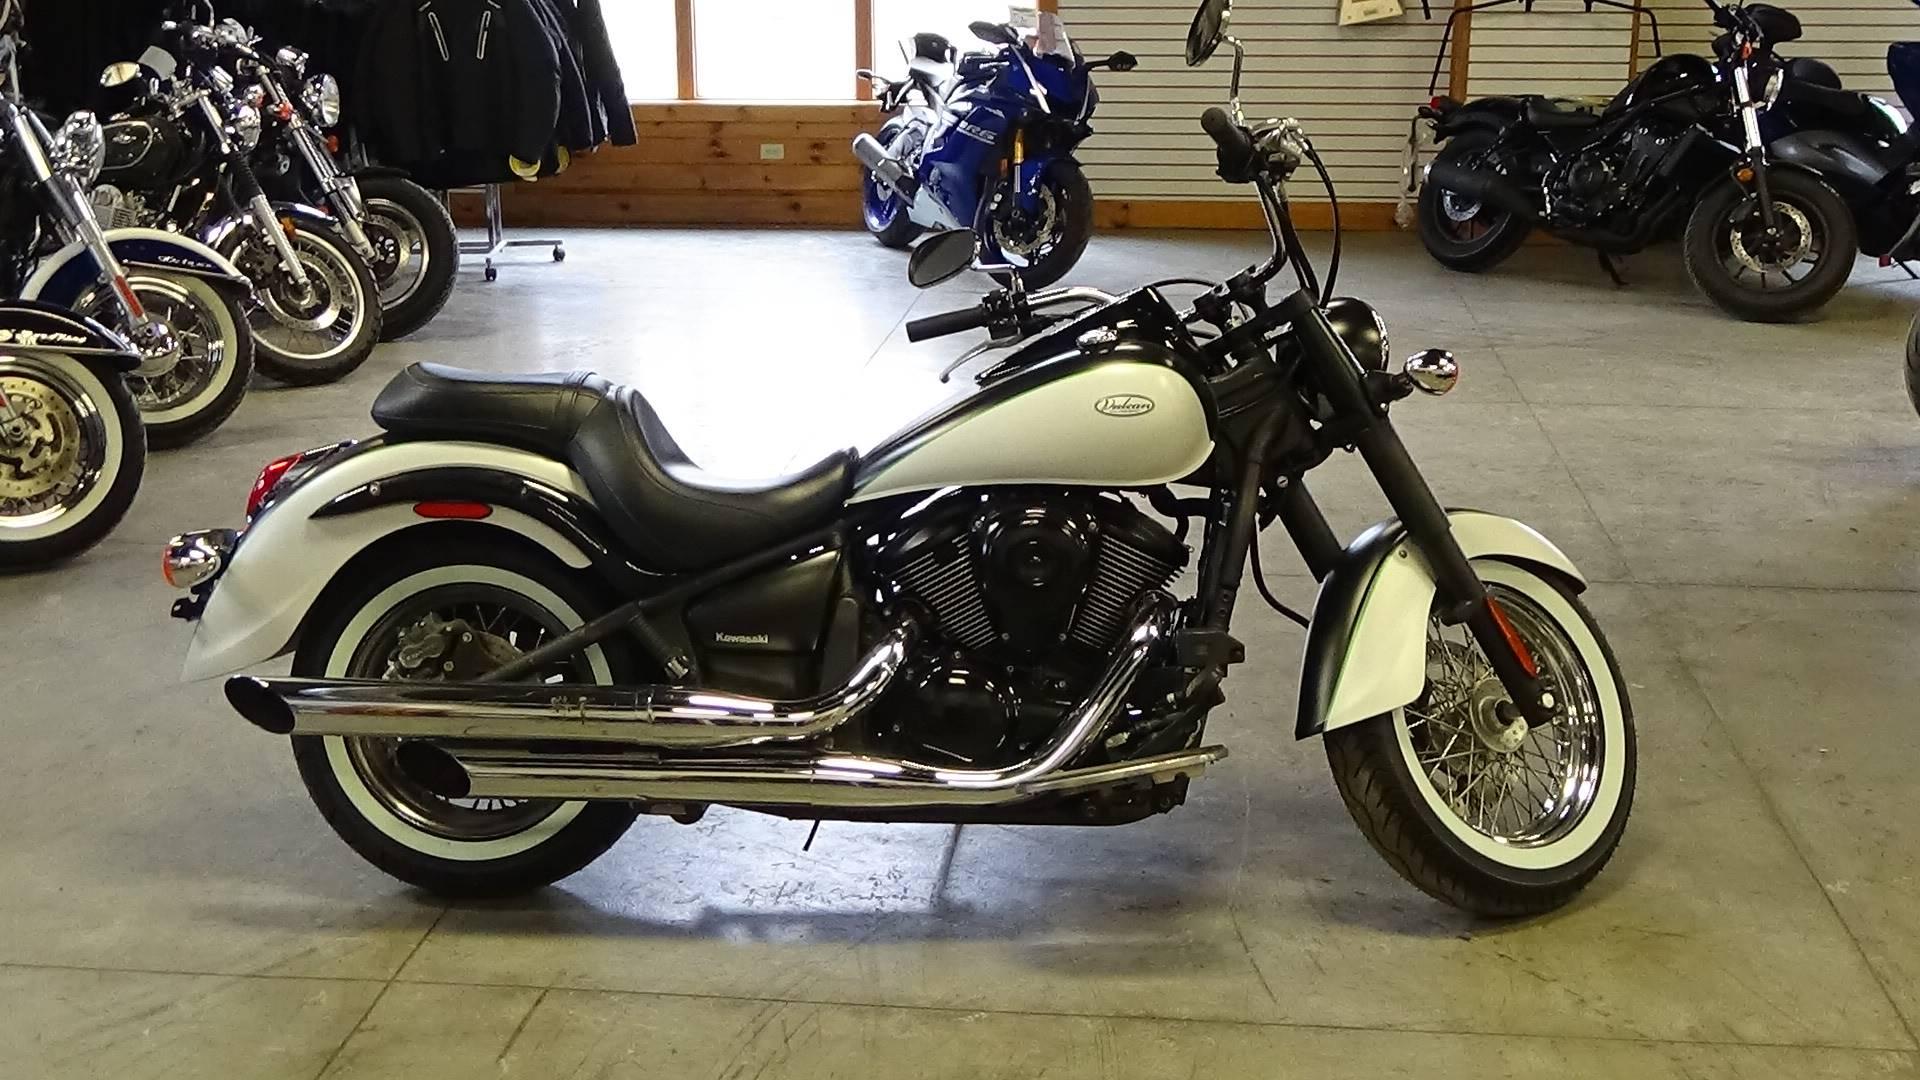 Used 2015 Kawasaki Vulcan® 900 Classic Motorcycles in Bennington, VT